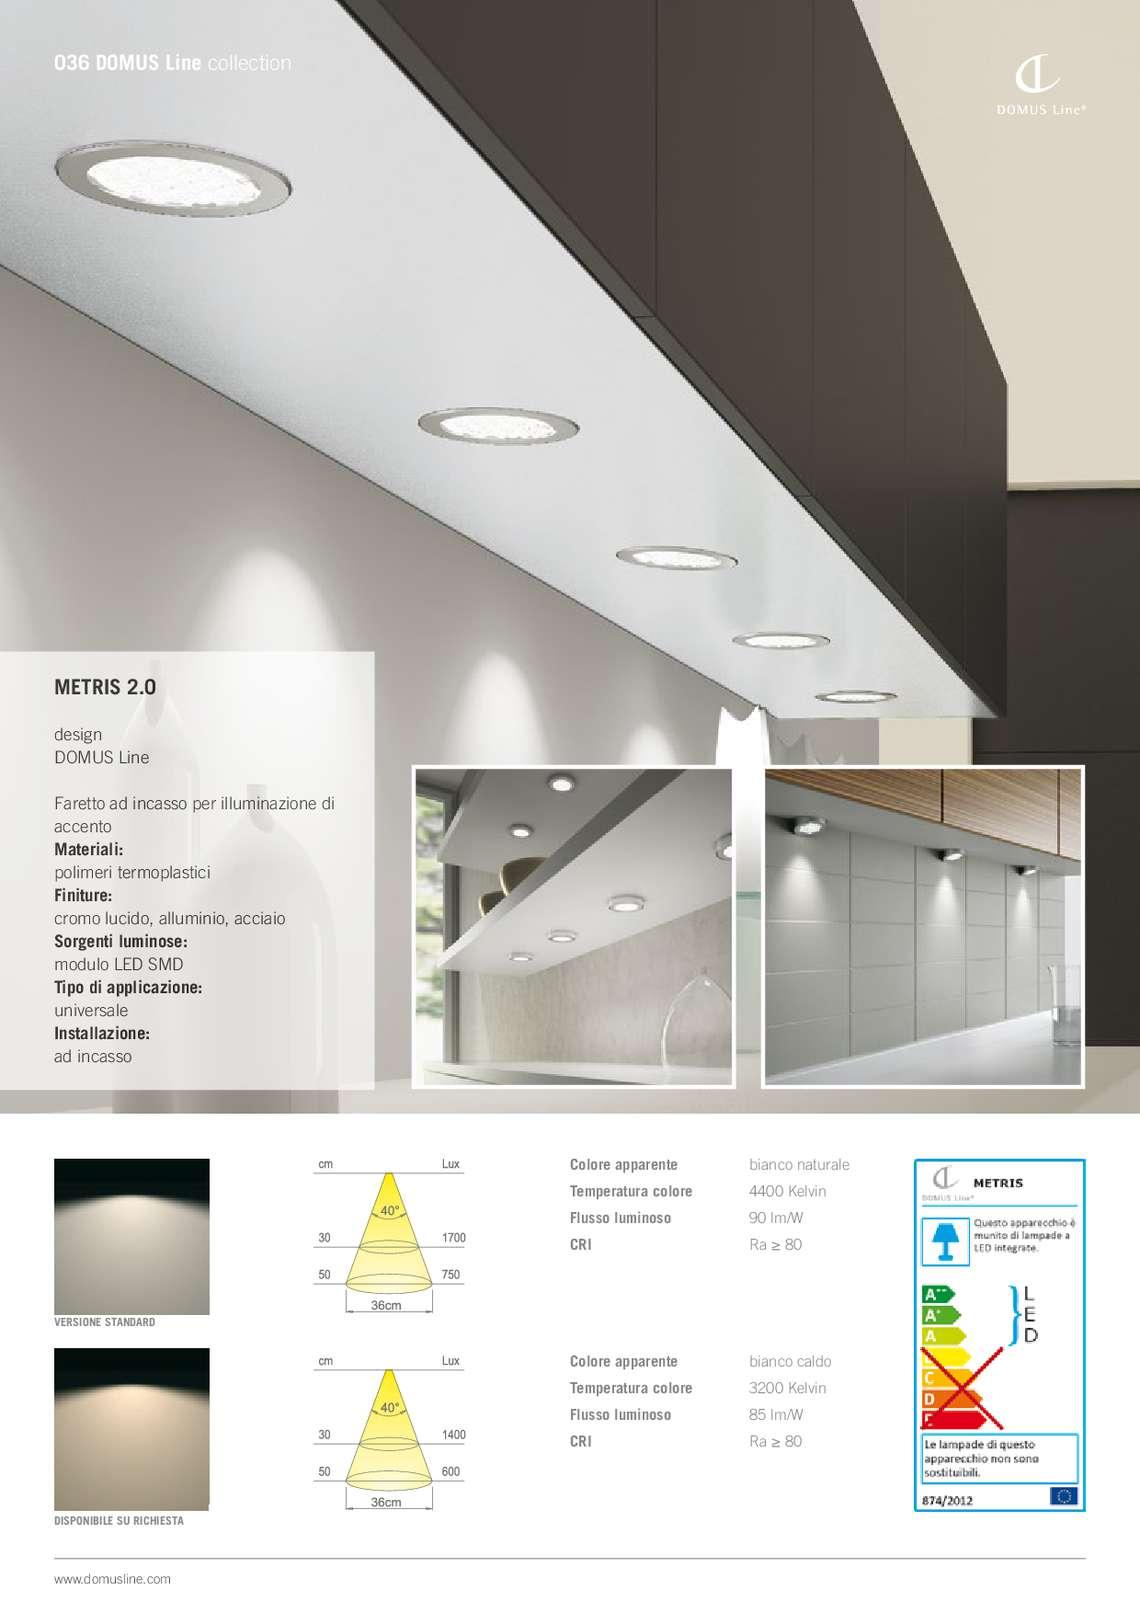 domus-line-illuminazione_26_036.jpg